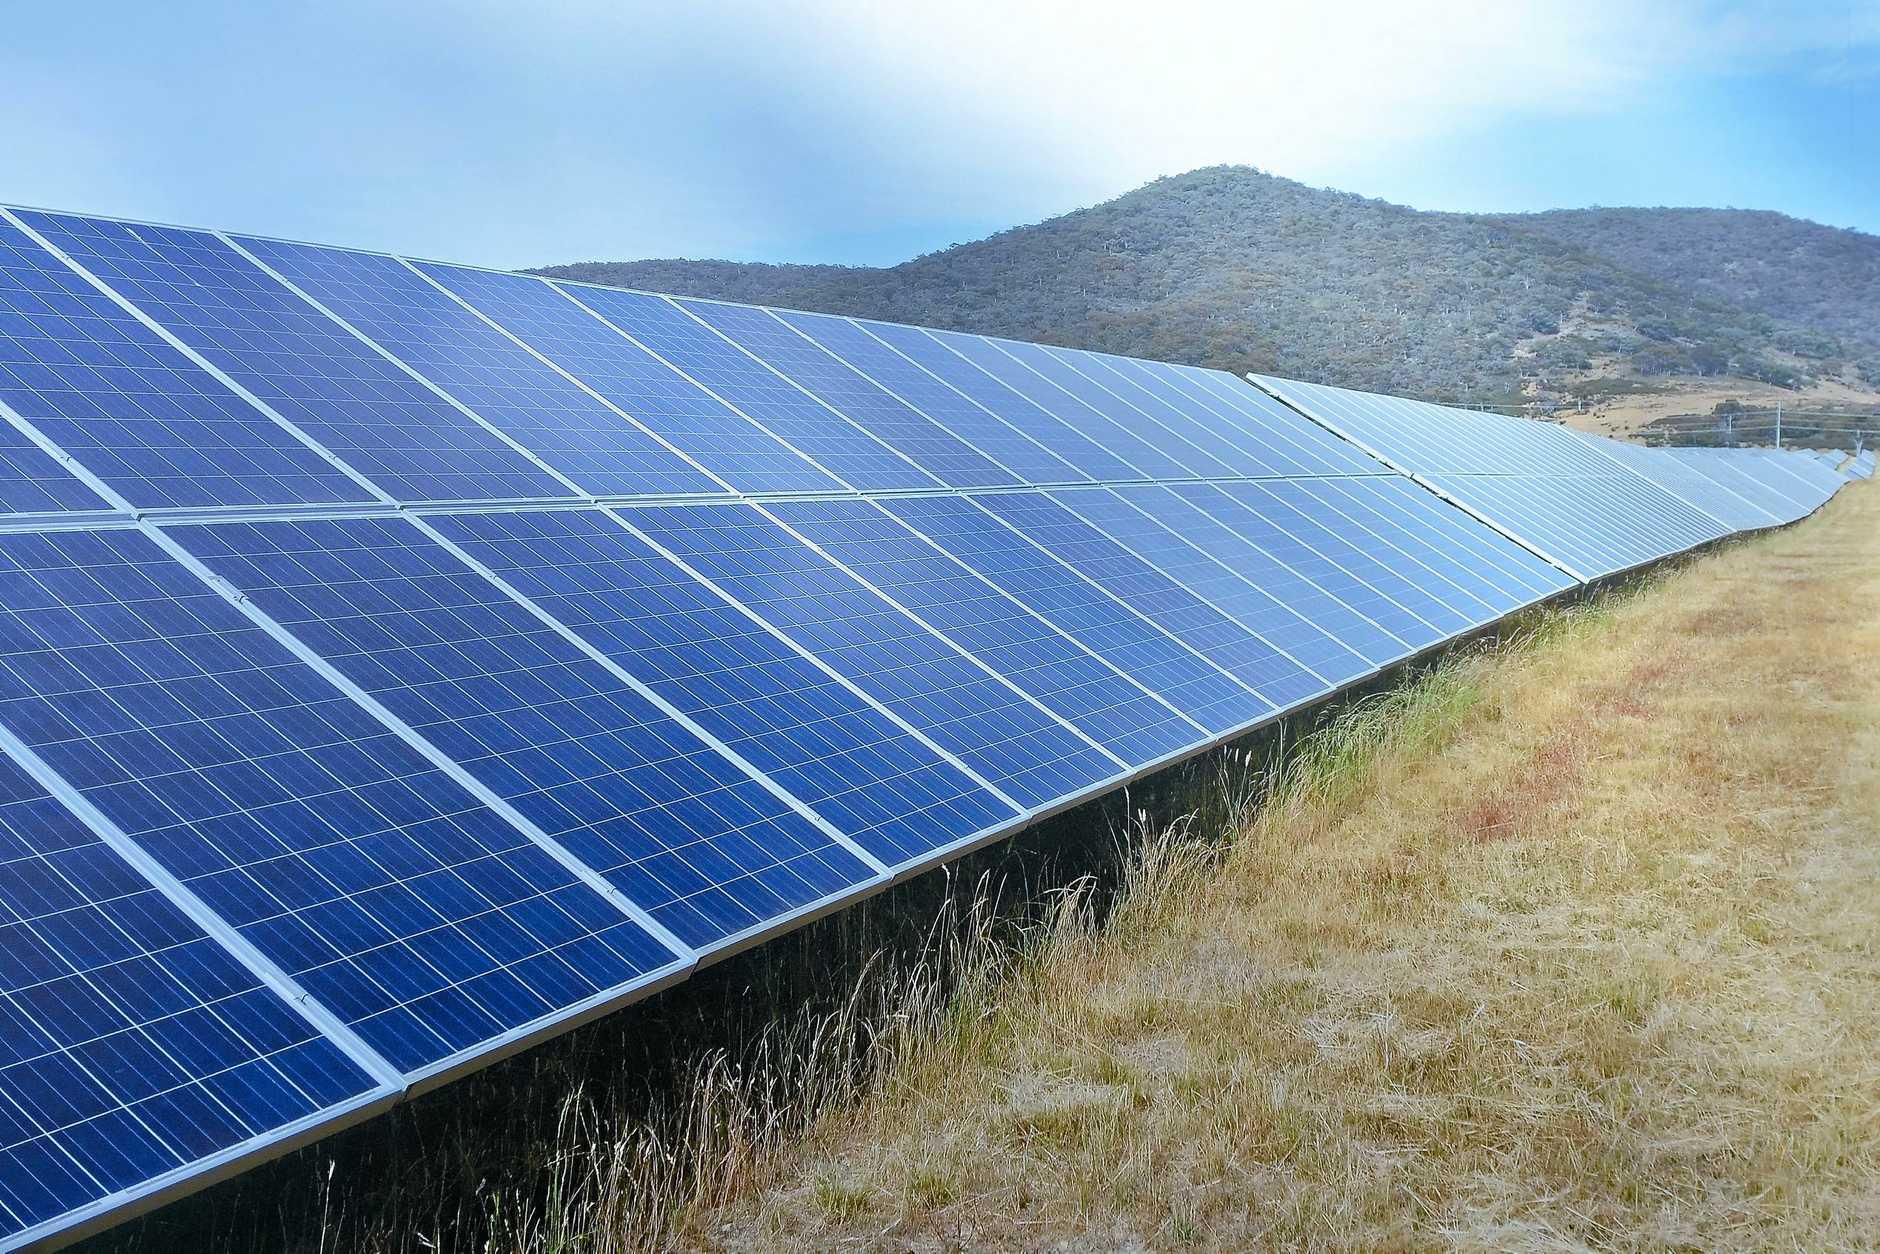 Australian solar farm developer Terrain Solar intends to soak up the Southern Downs sun with a huge 154-hectare farm, expected to produce 170 gigawatt hours per calendar year.